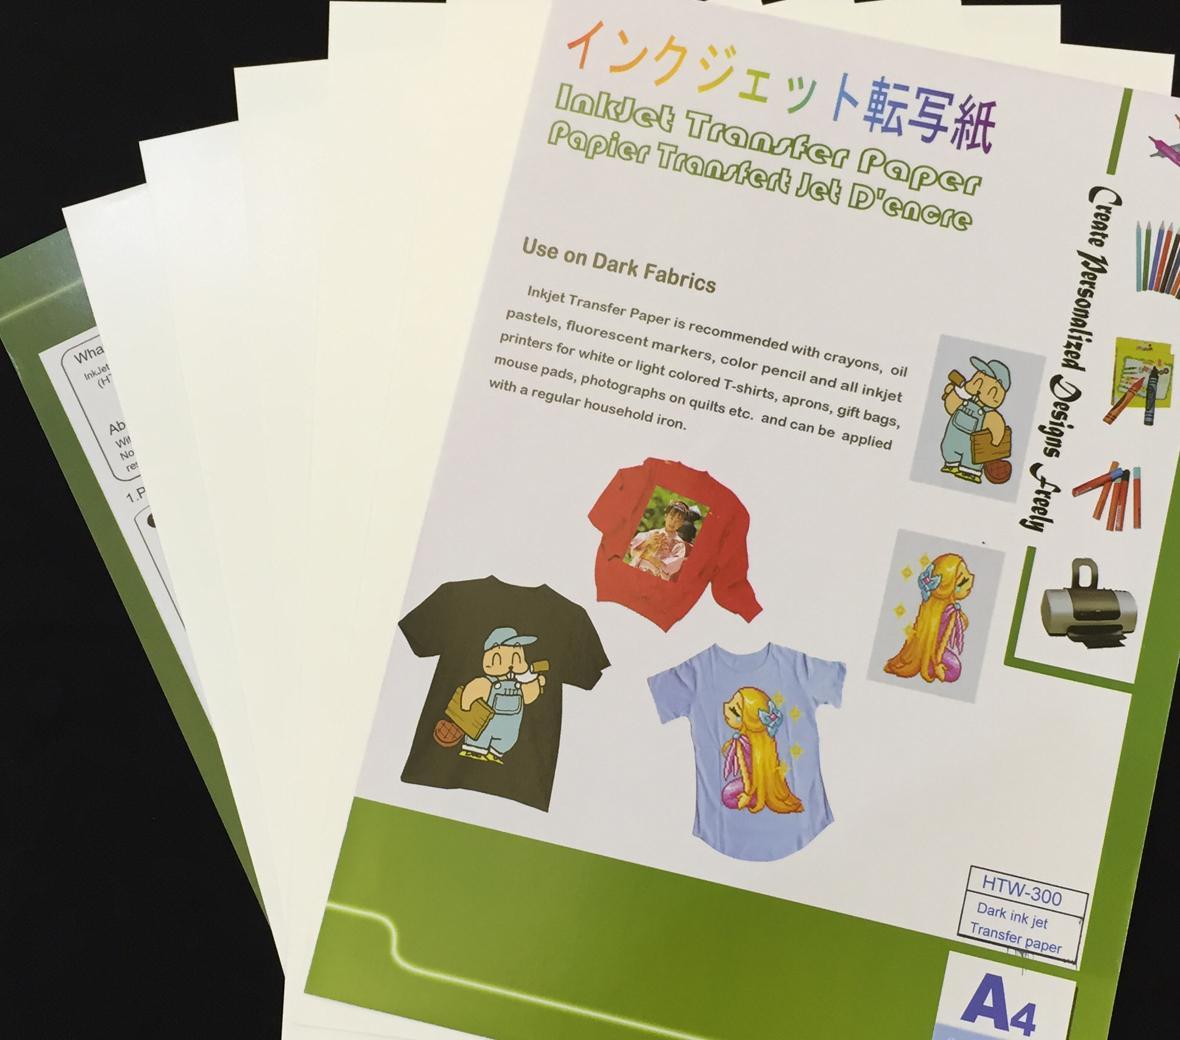 Alizarin Panda Dark InkJet Transfer Paper for 100% cotton T-shirts 2